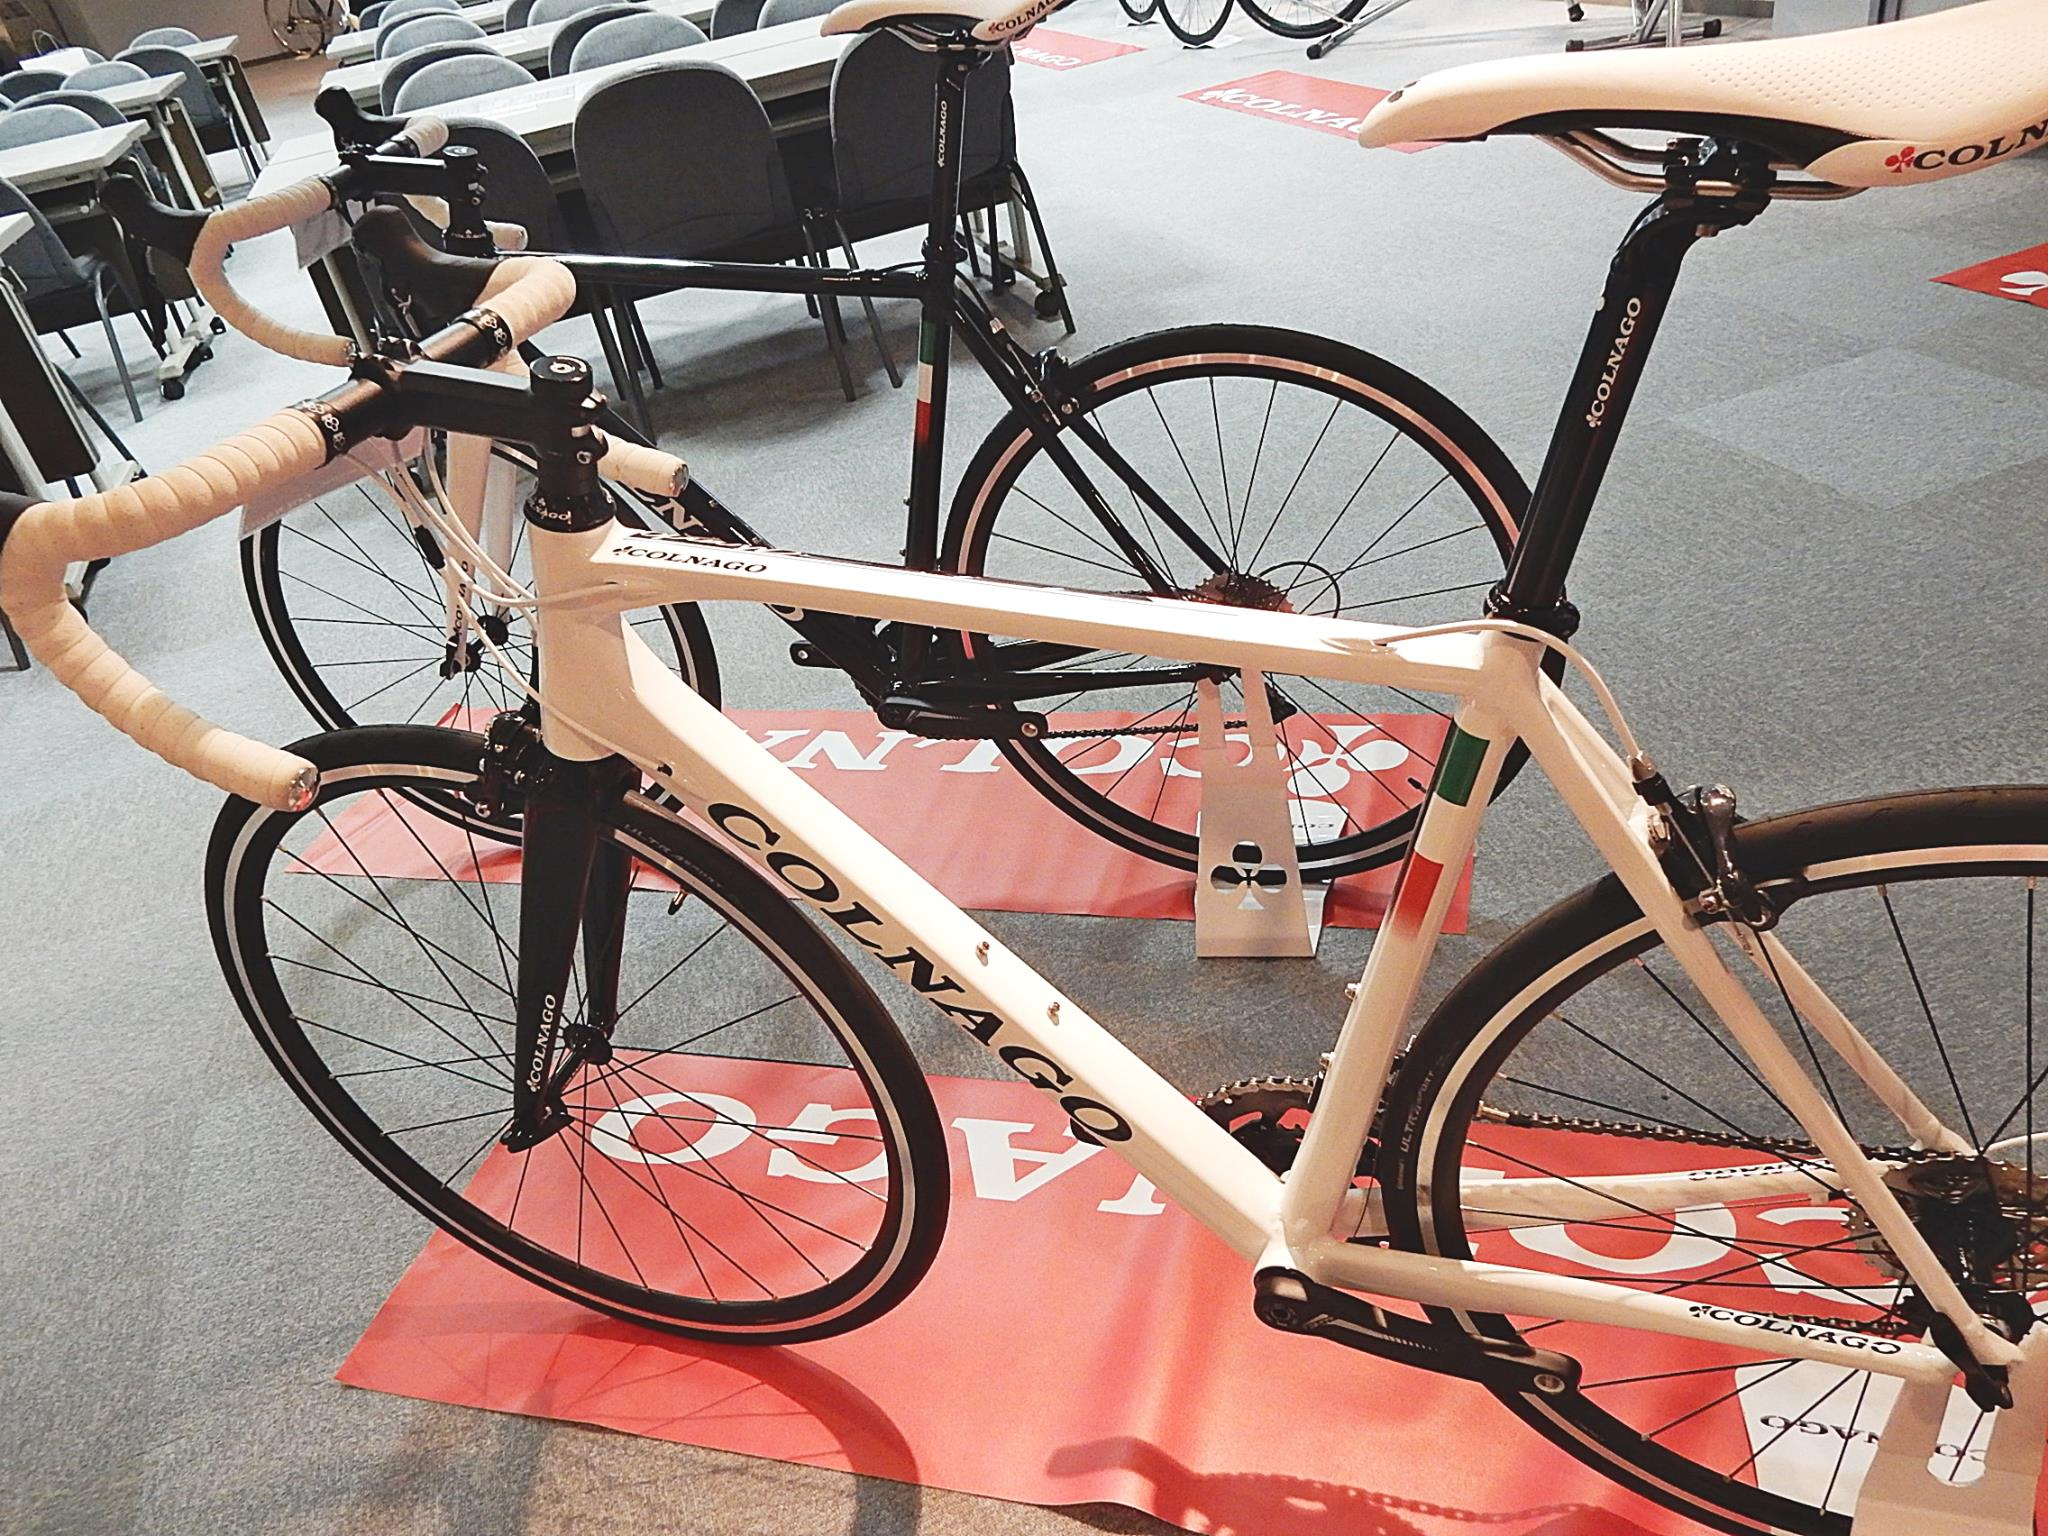 2017 COLNAGO colnago コルナゴ MONDO mondo 2.0  アルミロードバイク 完成車 サイクリング 広島県福山市 FINE fine ファイン